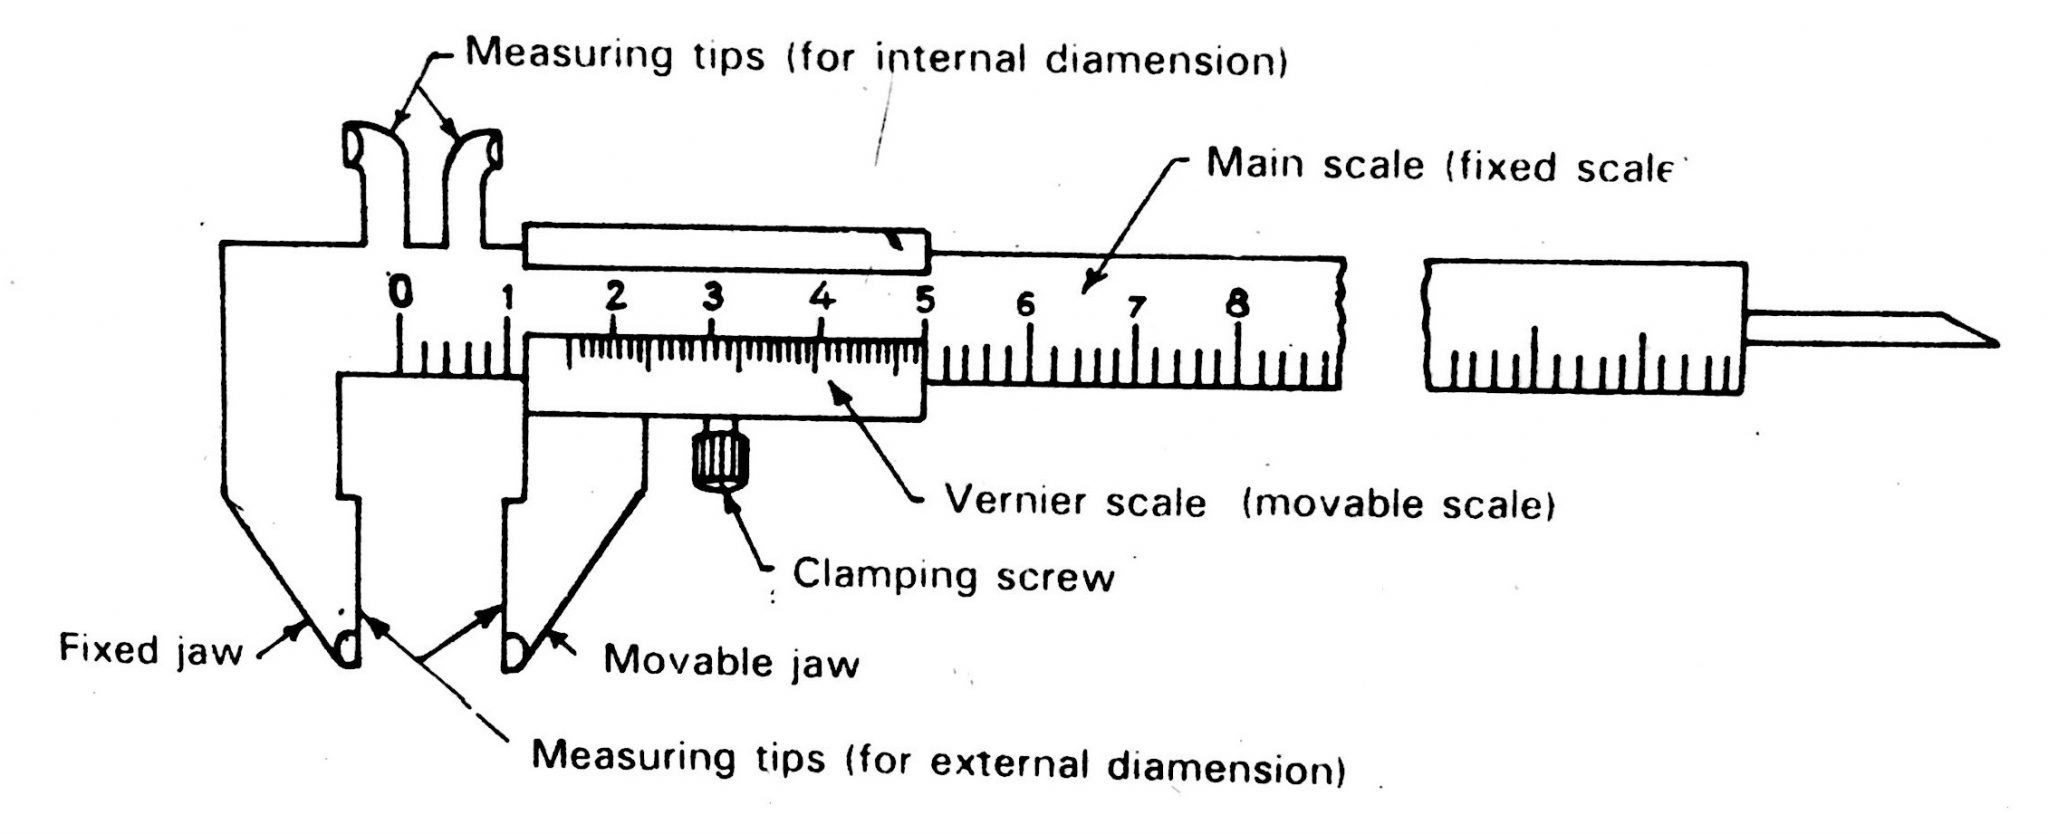 hight resolution of vernier calliper diagram working principle metrology diagram full diagram of vernier caliper full diagram of vernier caliper